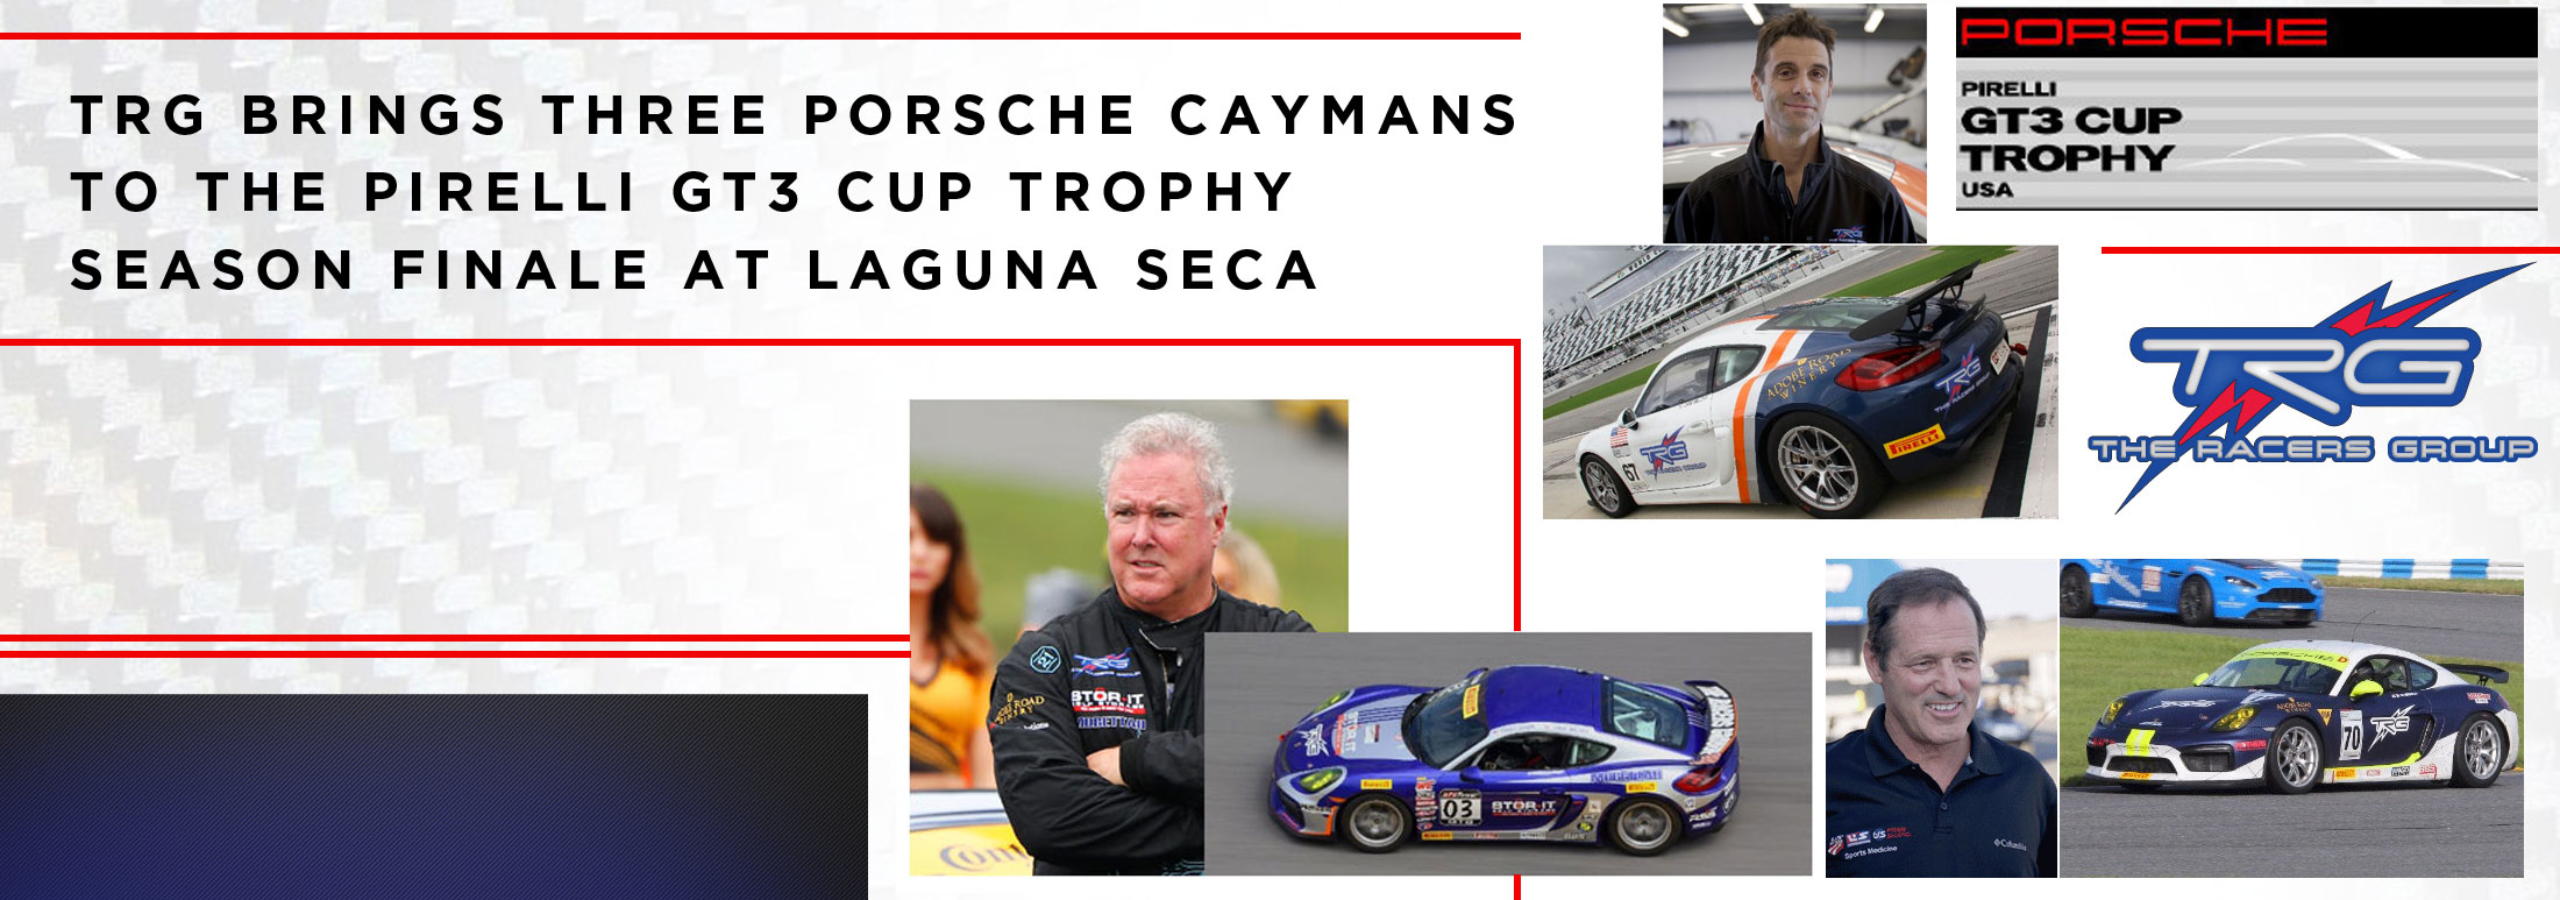 TRG Brings Three Porsche Caymans to the Pirelli GT3 Cup Trophy Season Finale at Laguna Seca